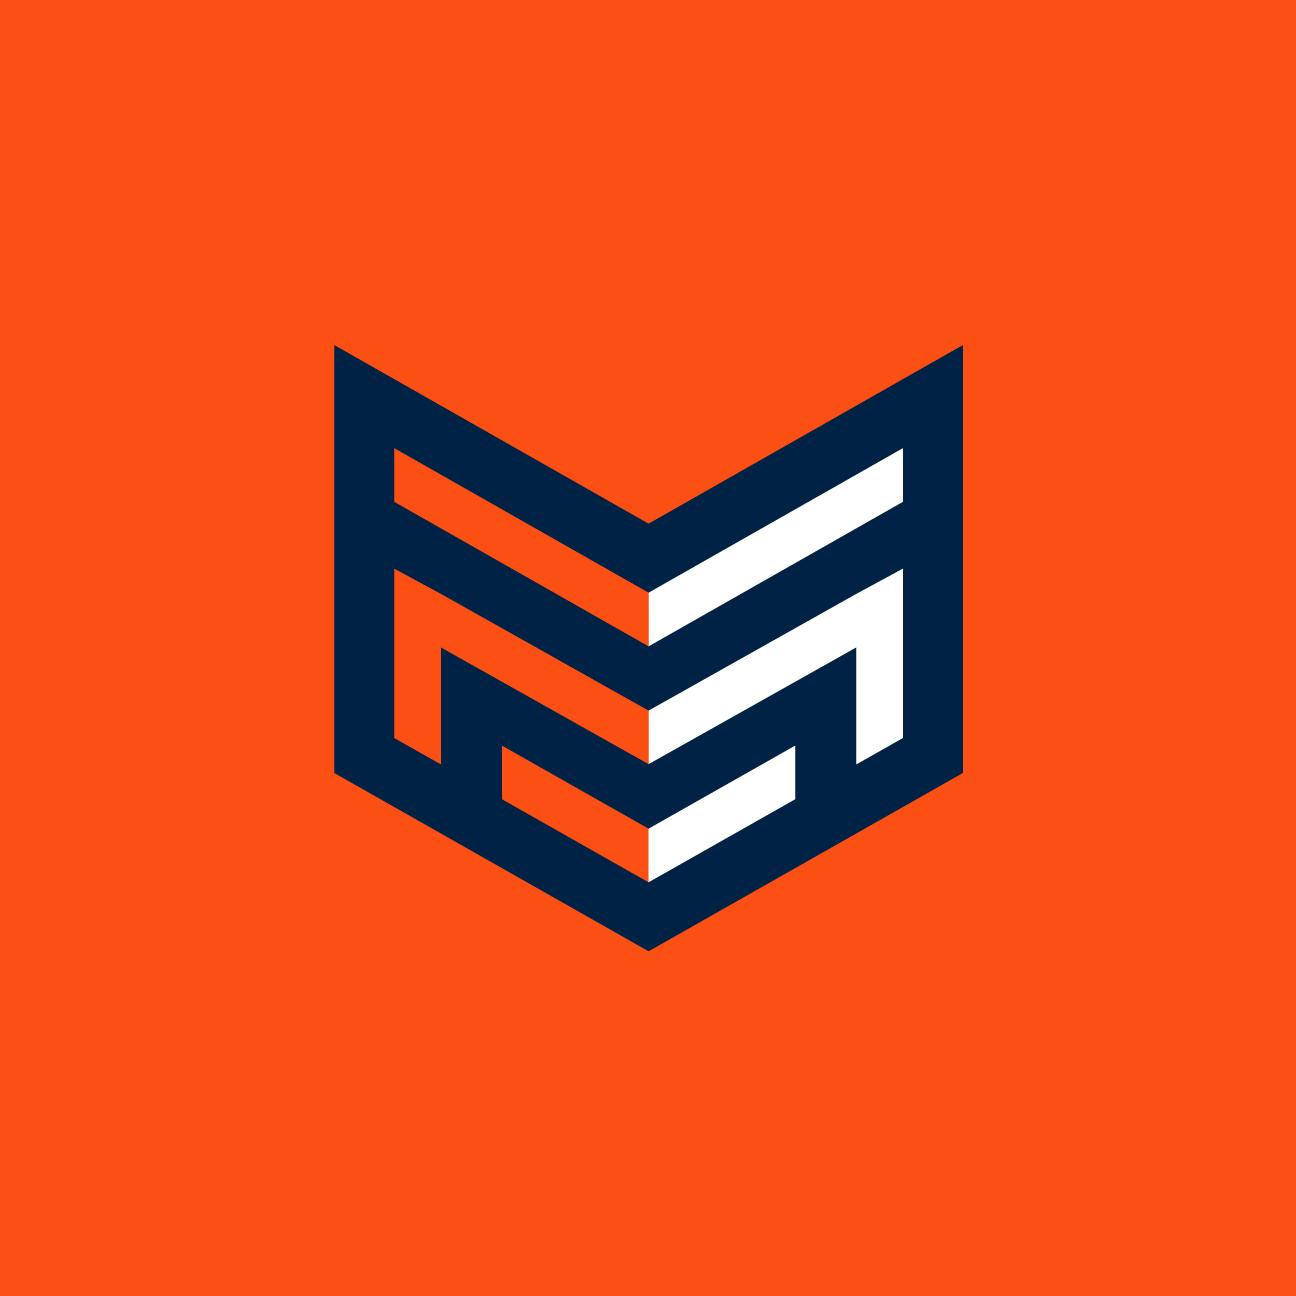 New Logos For 10 Nfl Stars Tom Brady Rob Gronkowski Of New England Patriots Aaron Rodgers Of Green Bay Packers Logos Pin Logo Logos Design